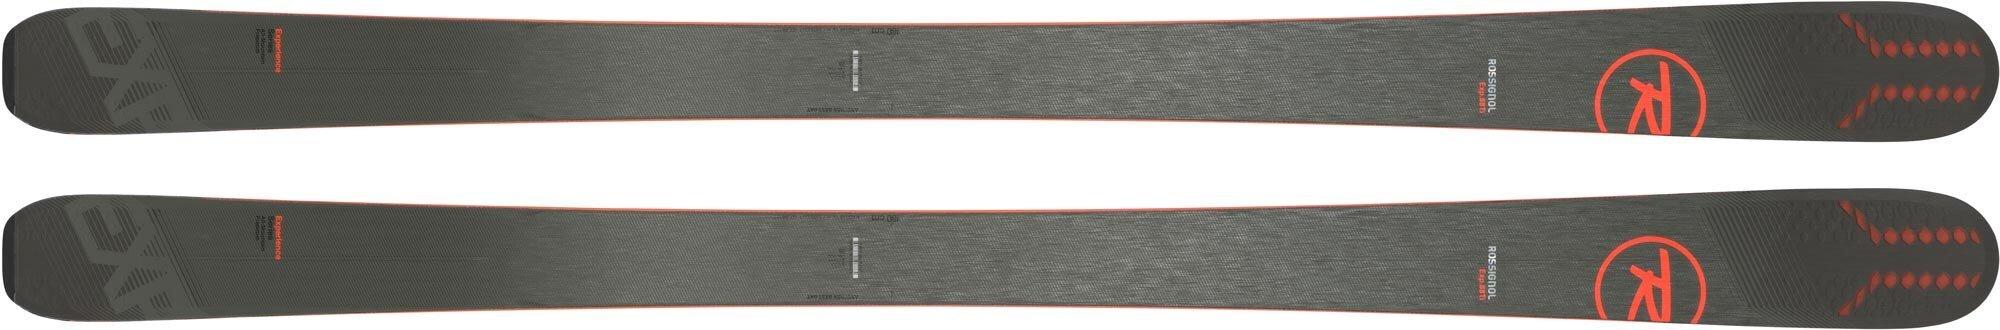 Rossignol EXP 88HD availble in 156cm, 164cm, 172cm and 180cm